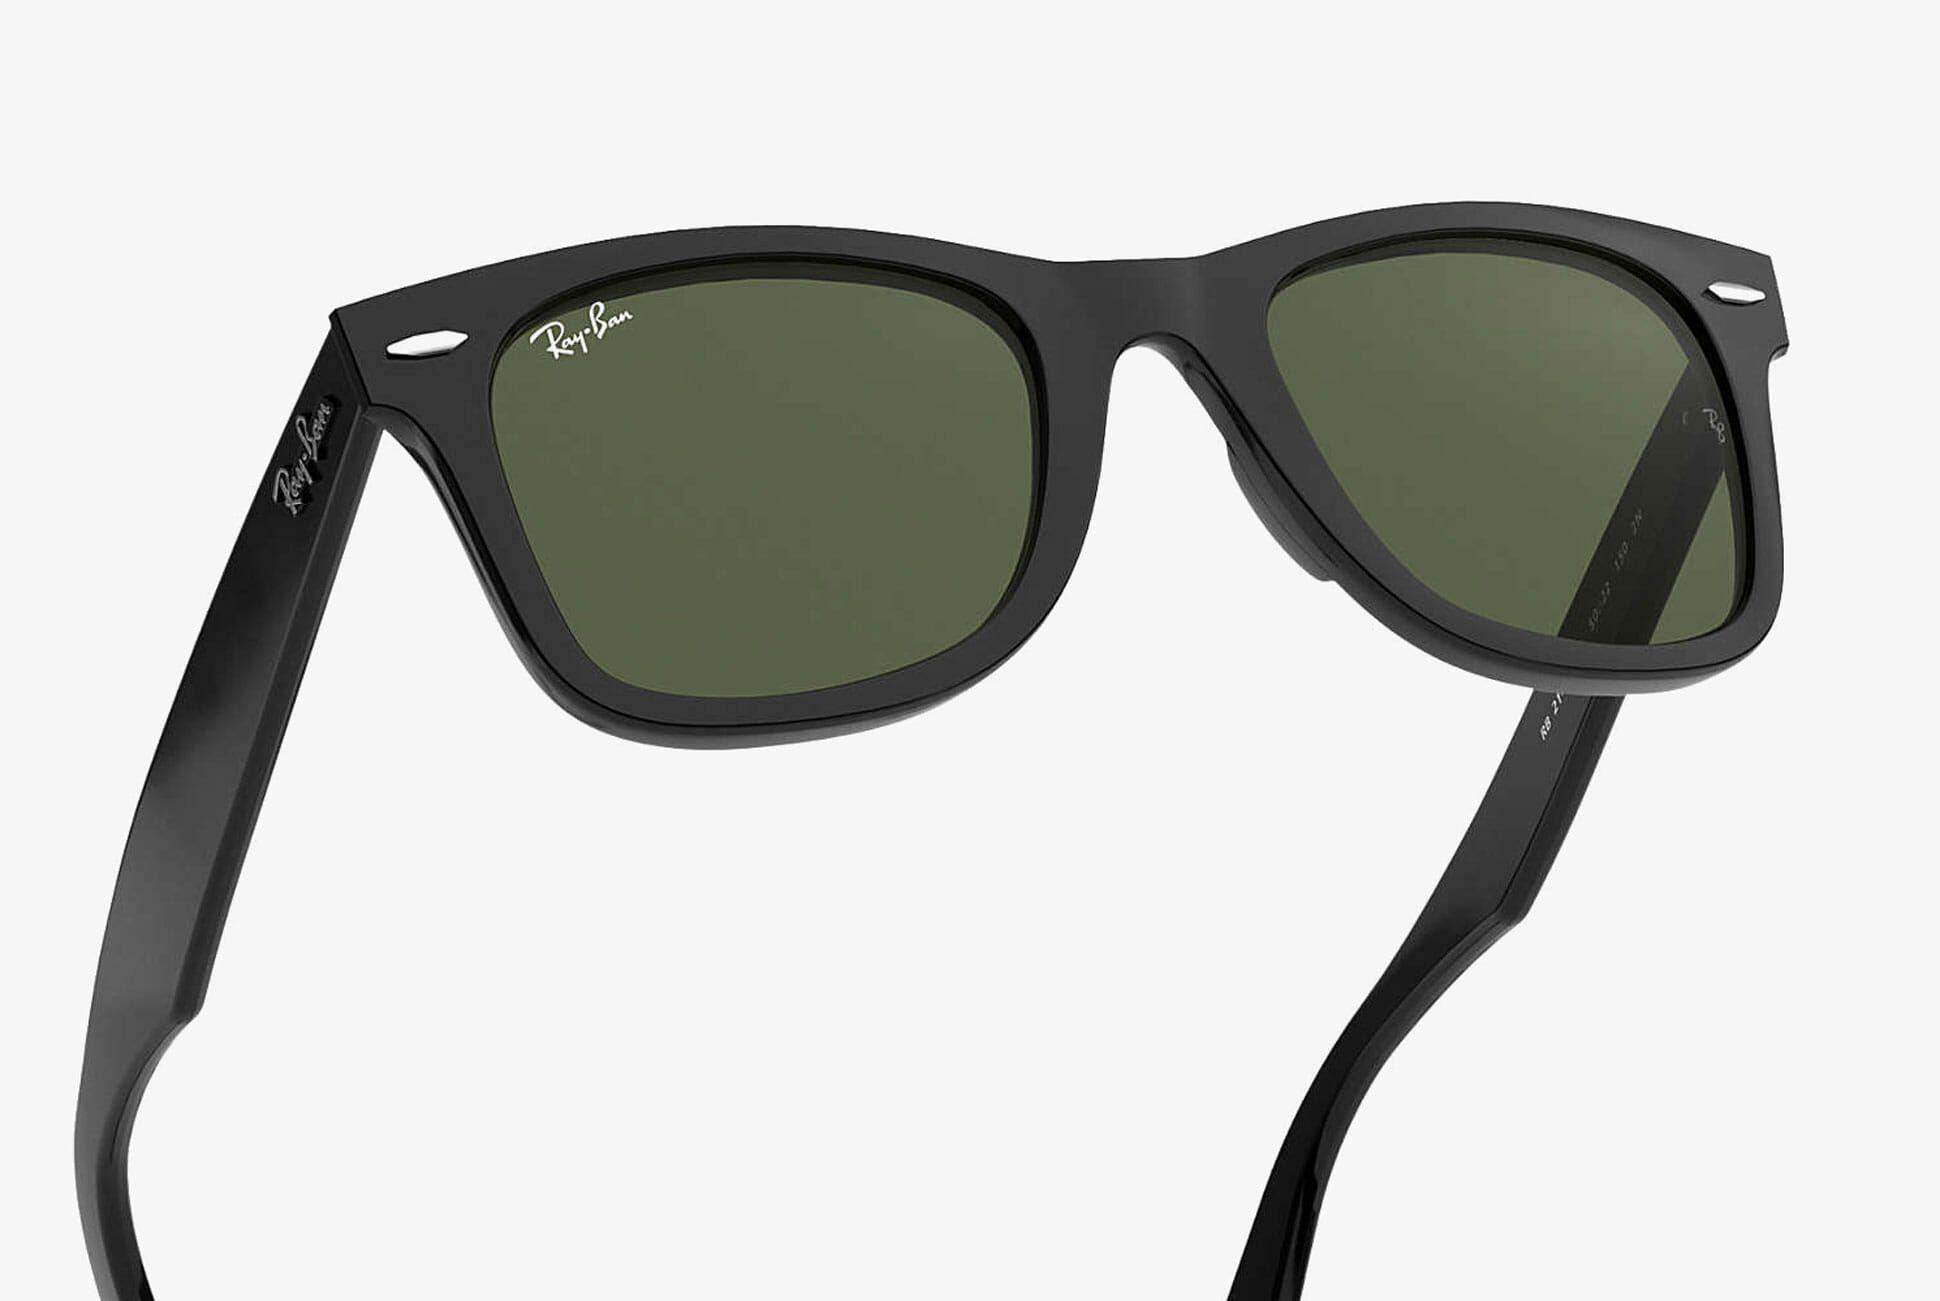 Ray Ban Wayfarer Sunglasses with Original Box